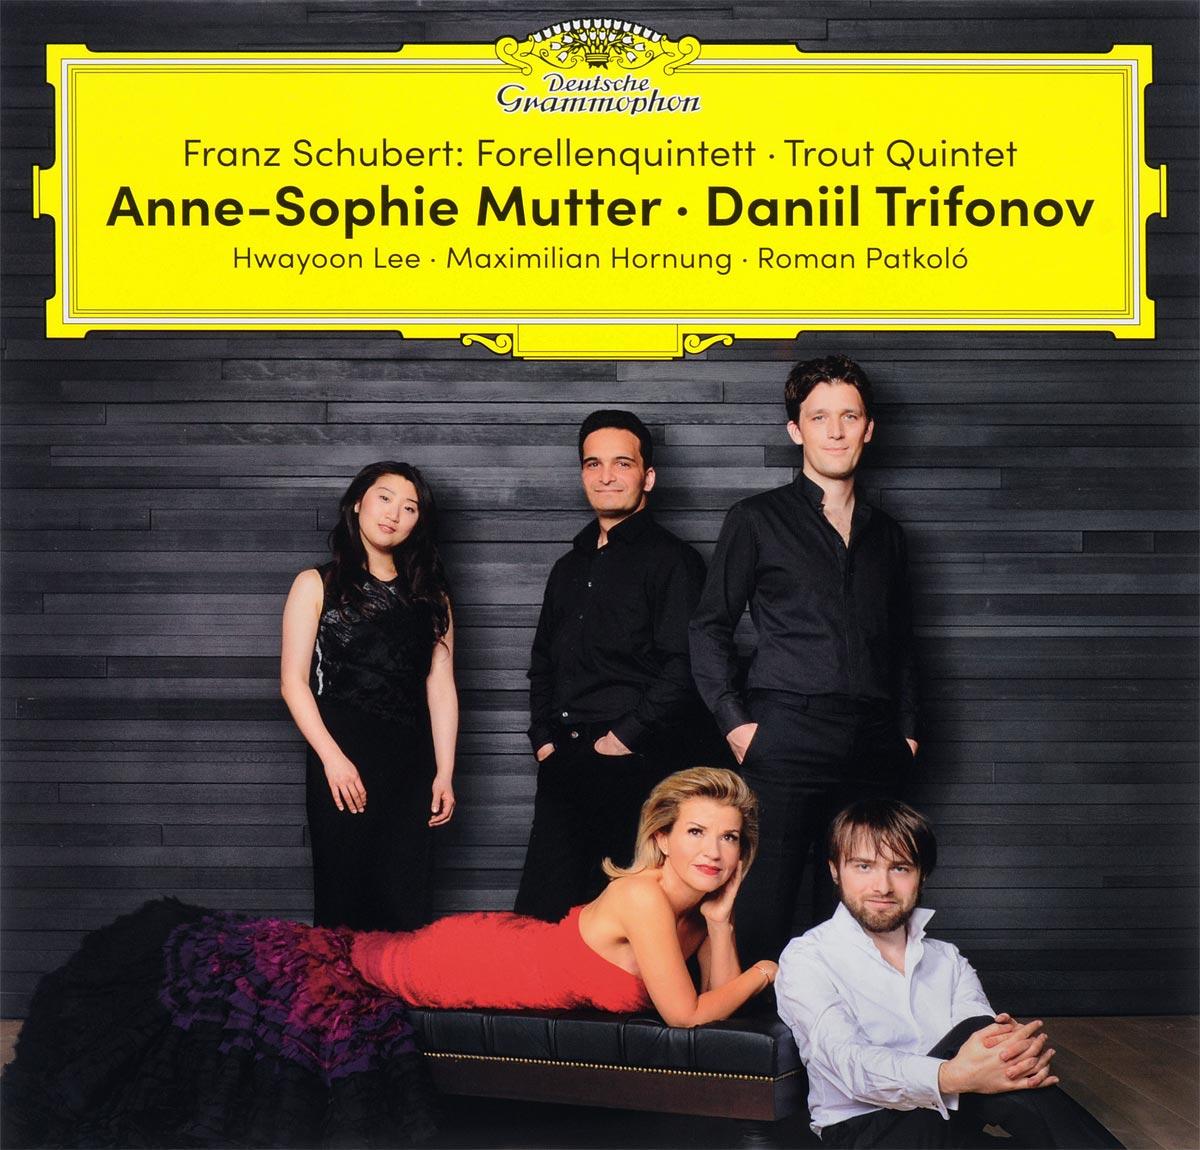 лучшая цена Franz Schubert. Anne-Sophie Mutter, Daniil Trifonov. Forellenquintett (Trout Quintet) (2 LP)